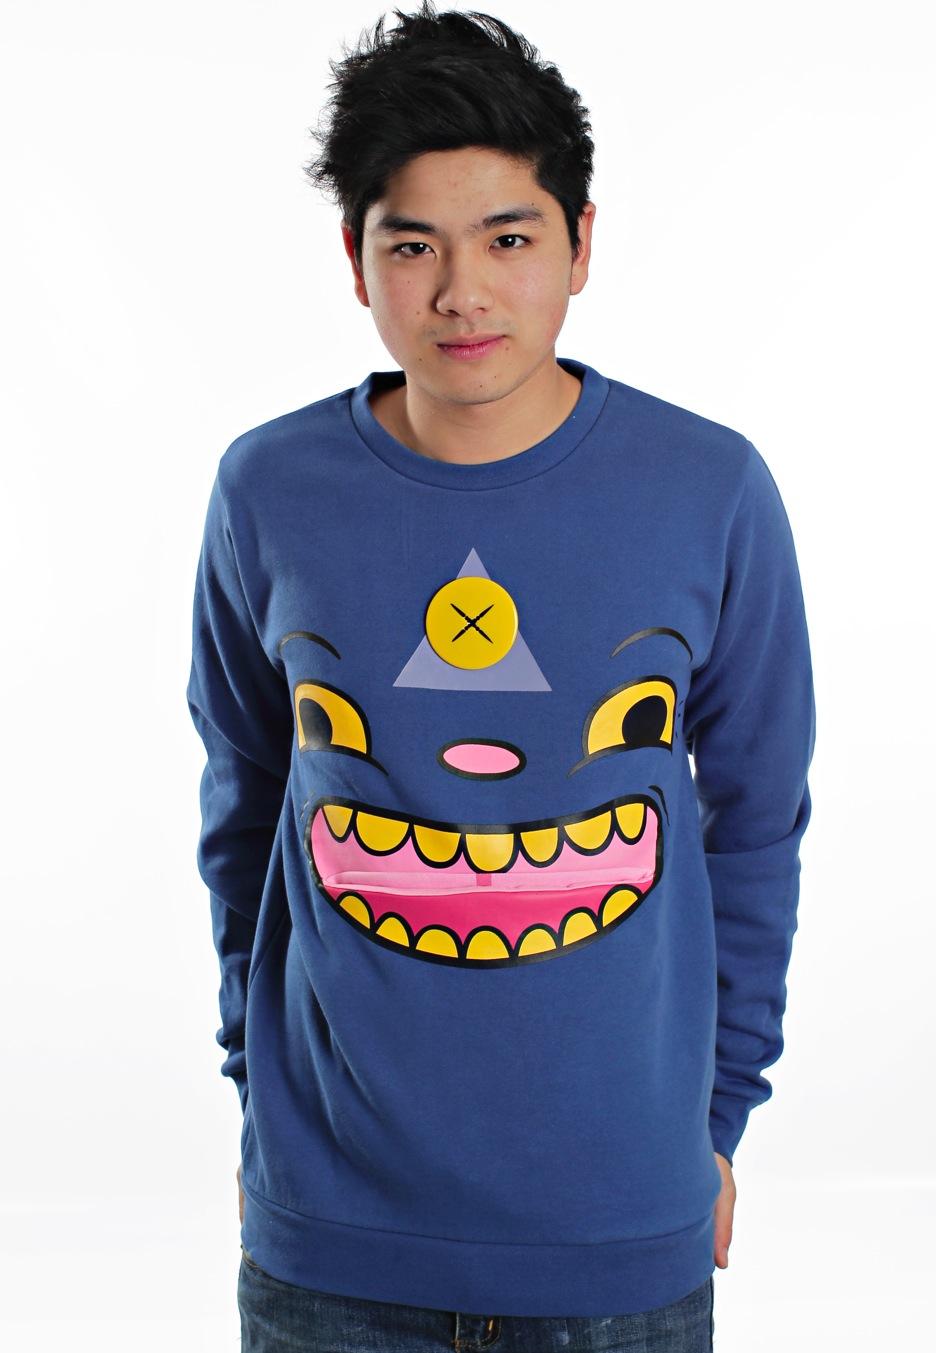 Drop Dead - Tripster Blue - Sweater - Impericon.com Worldwide